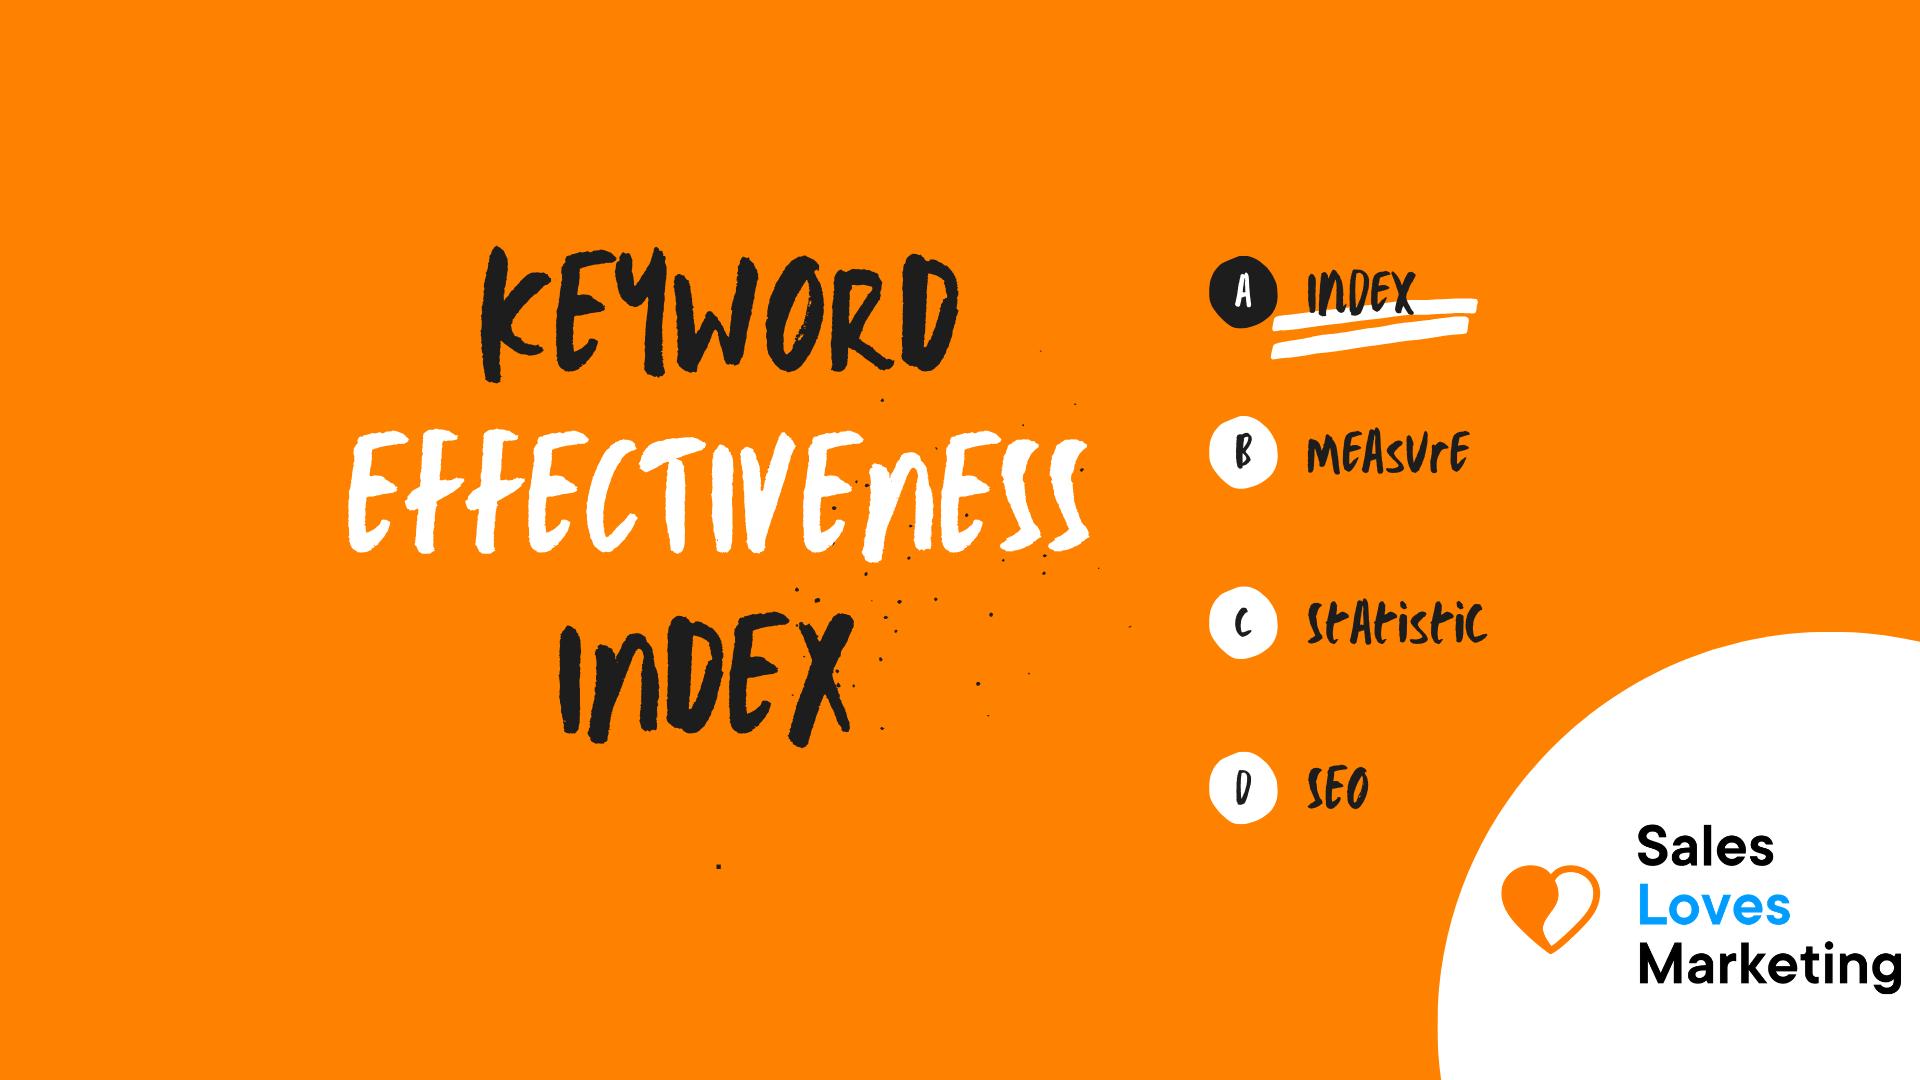 Keyword Effectiveness Index (KEI)